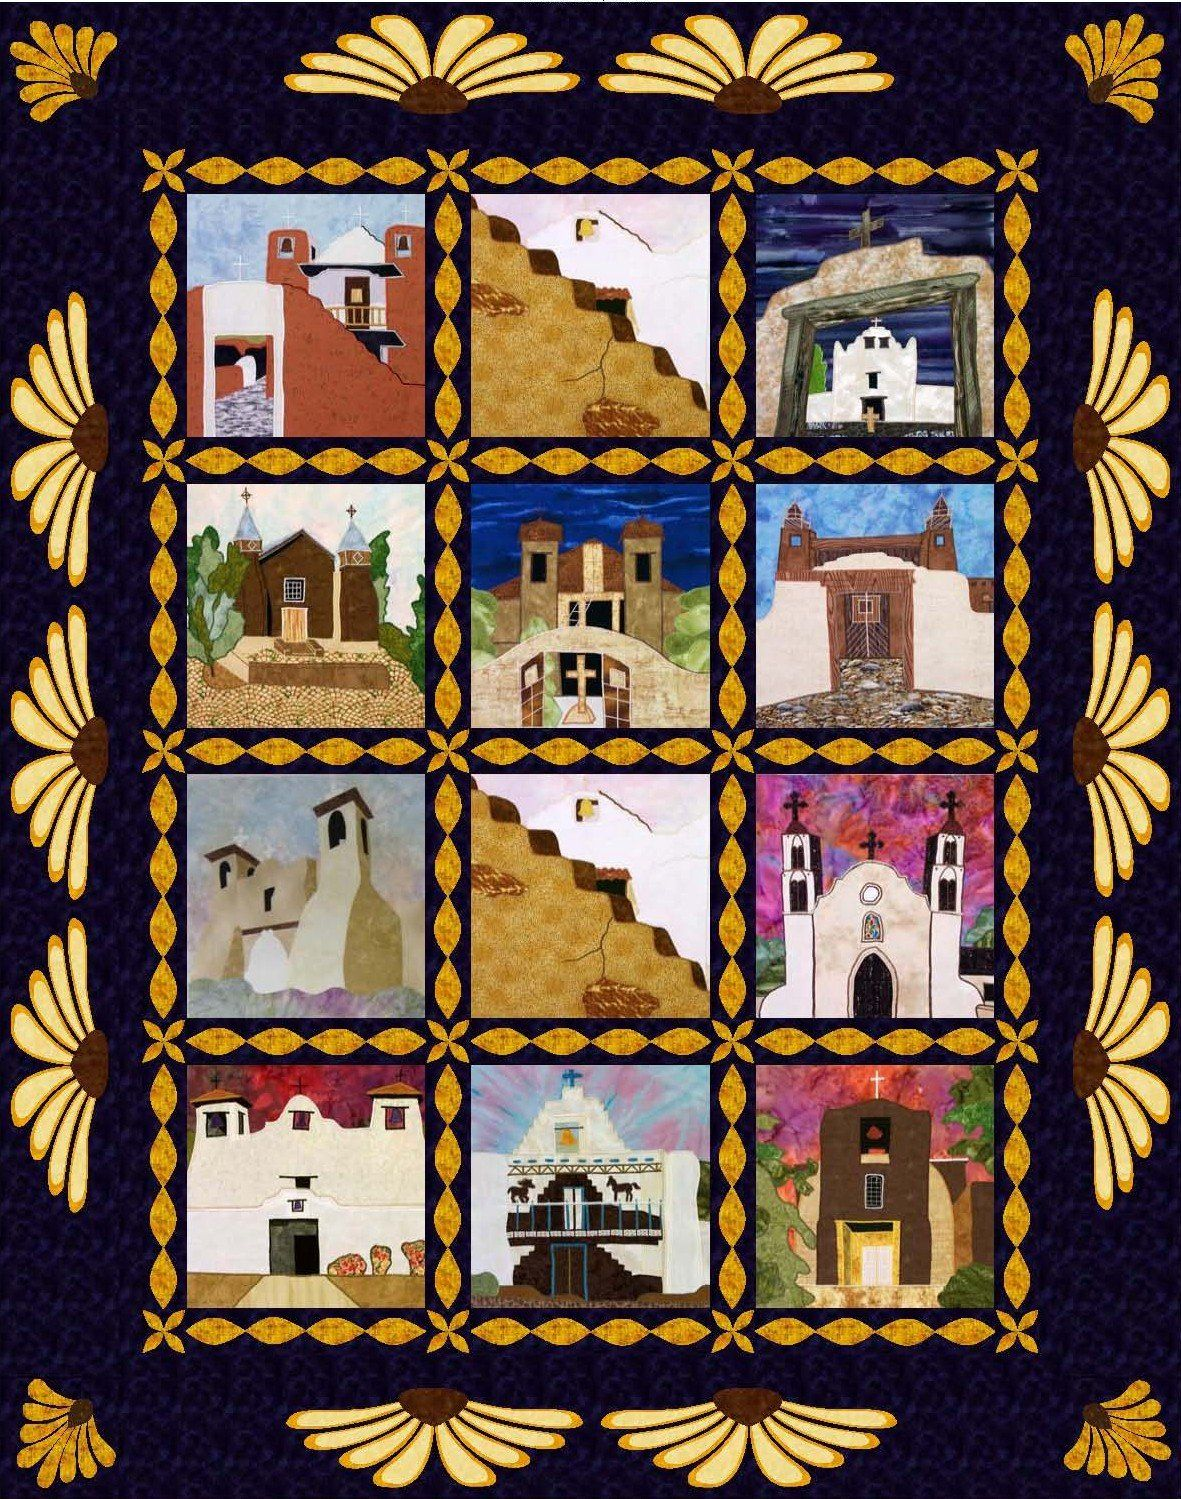 Southwest Decoratives | Albuquerque, NM | Make it Southwest Style ... : quilt shops albuquerque - Adamdwight.com